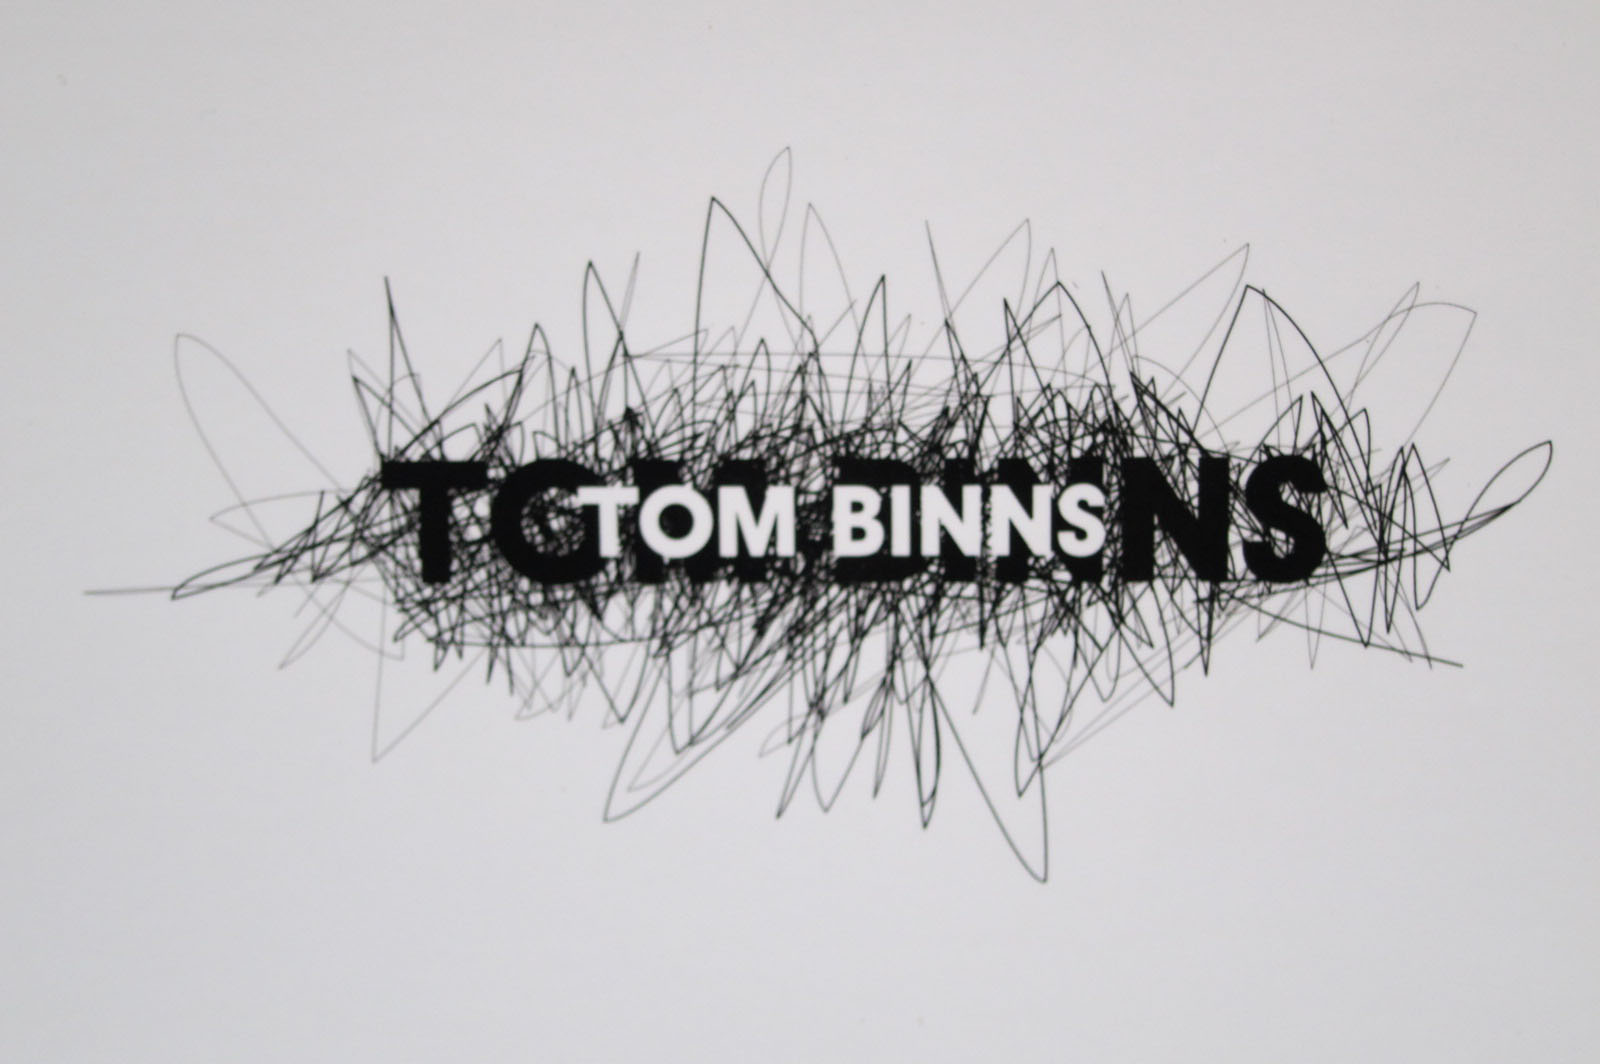 Tom Binns Logo Wallpaper